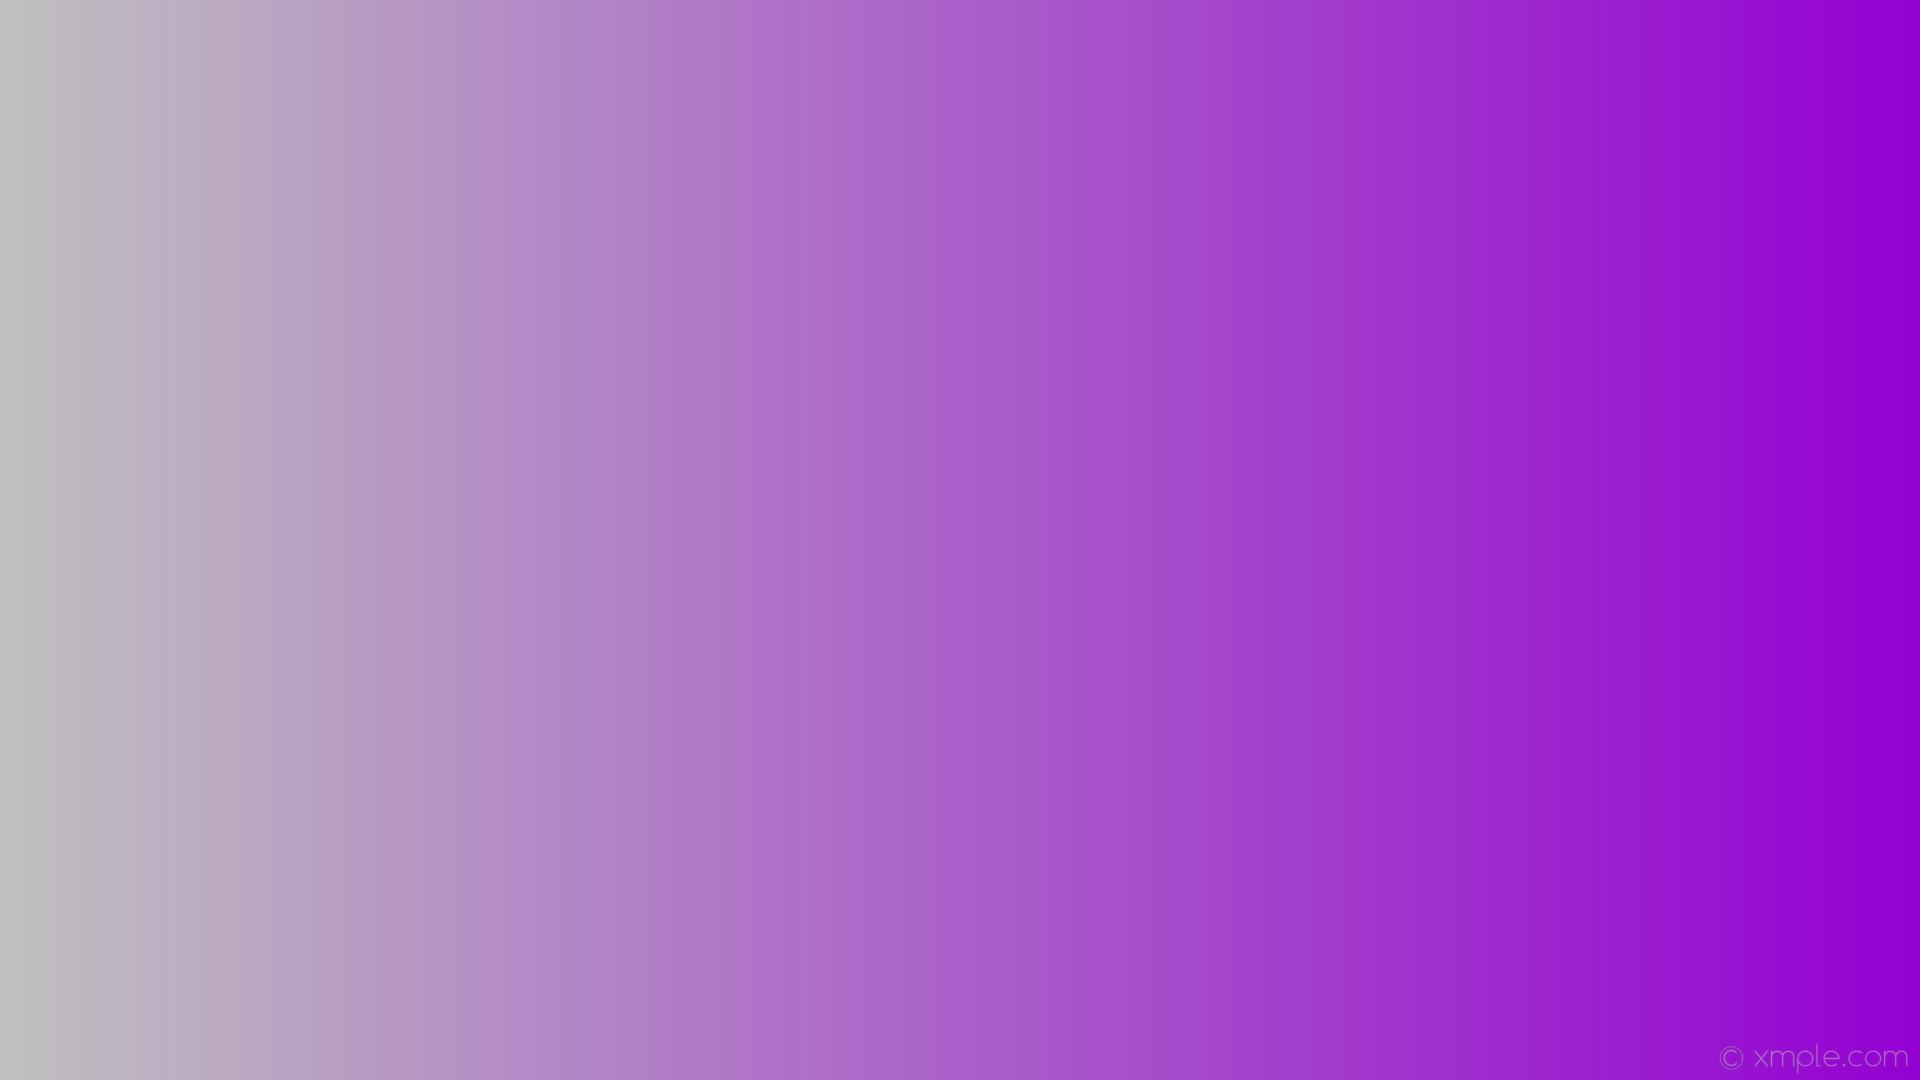 wallpaper purple grey gradient linear dark violet silver #9400d3 #c0c0c0 0°